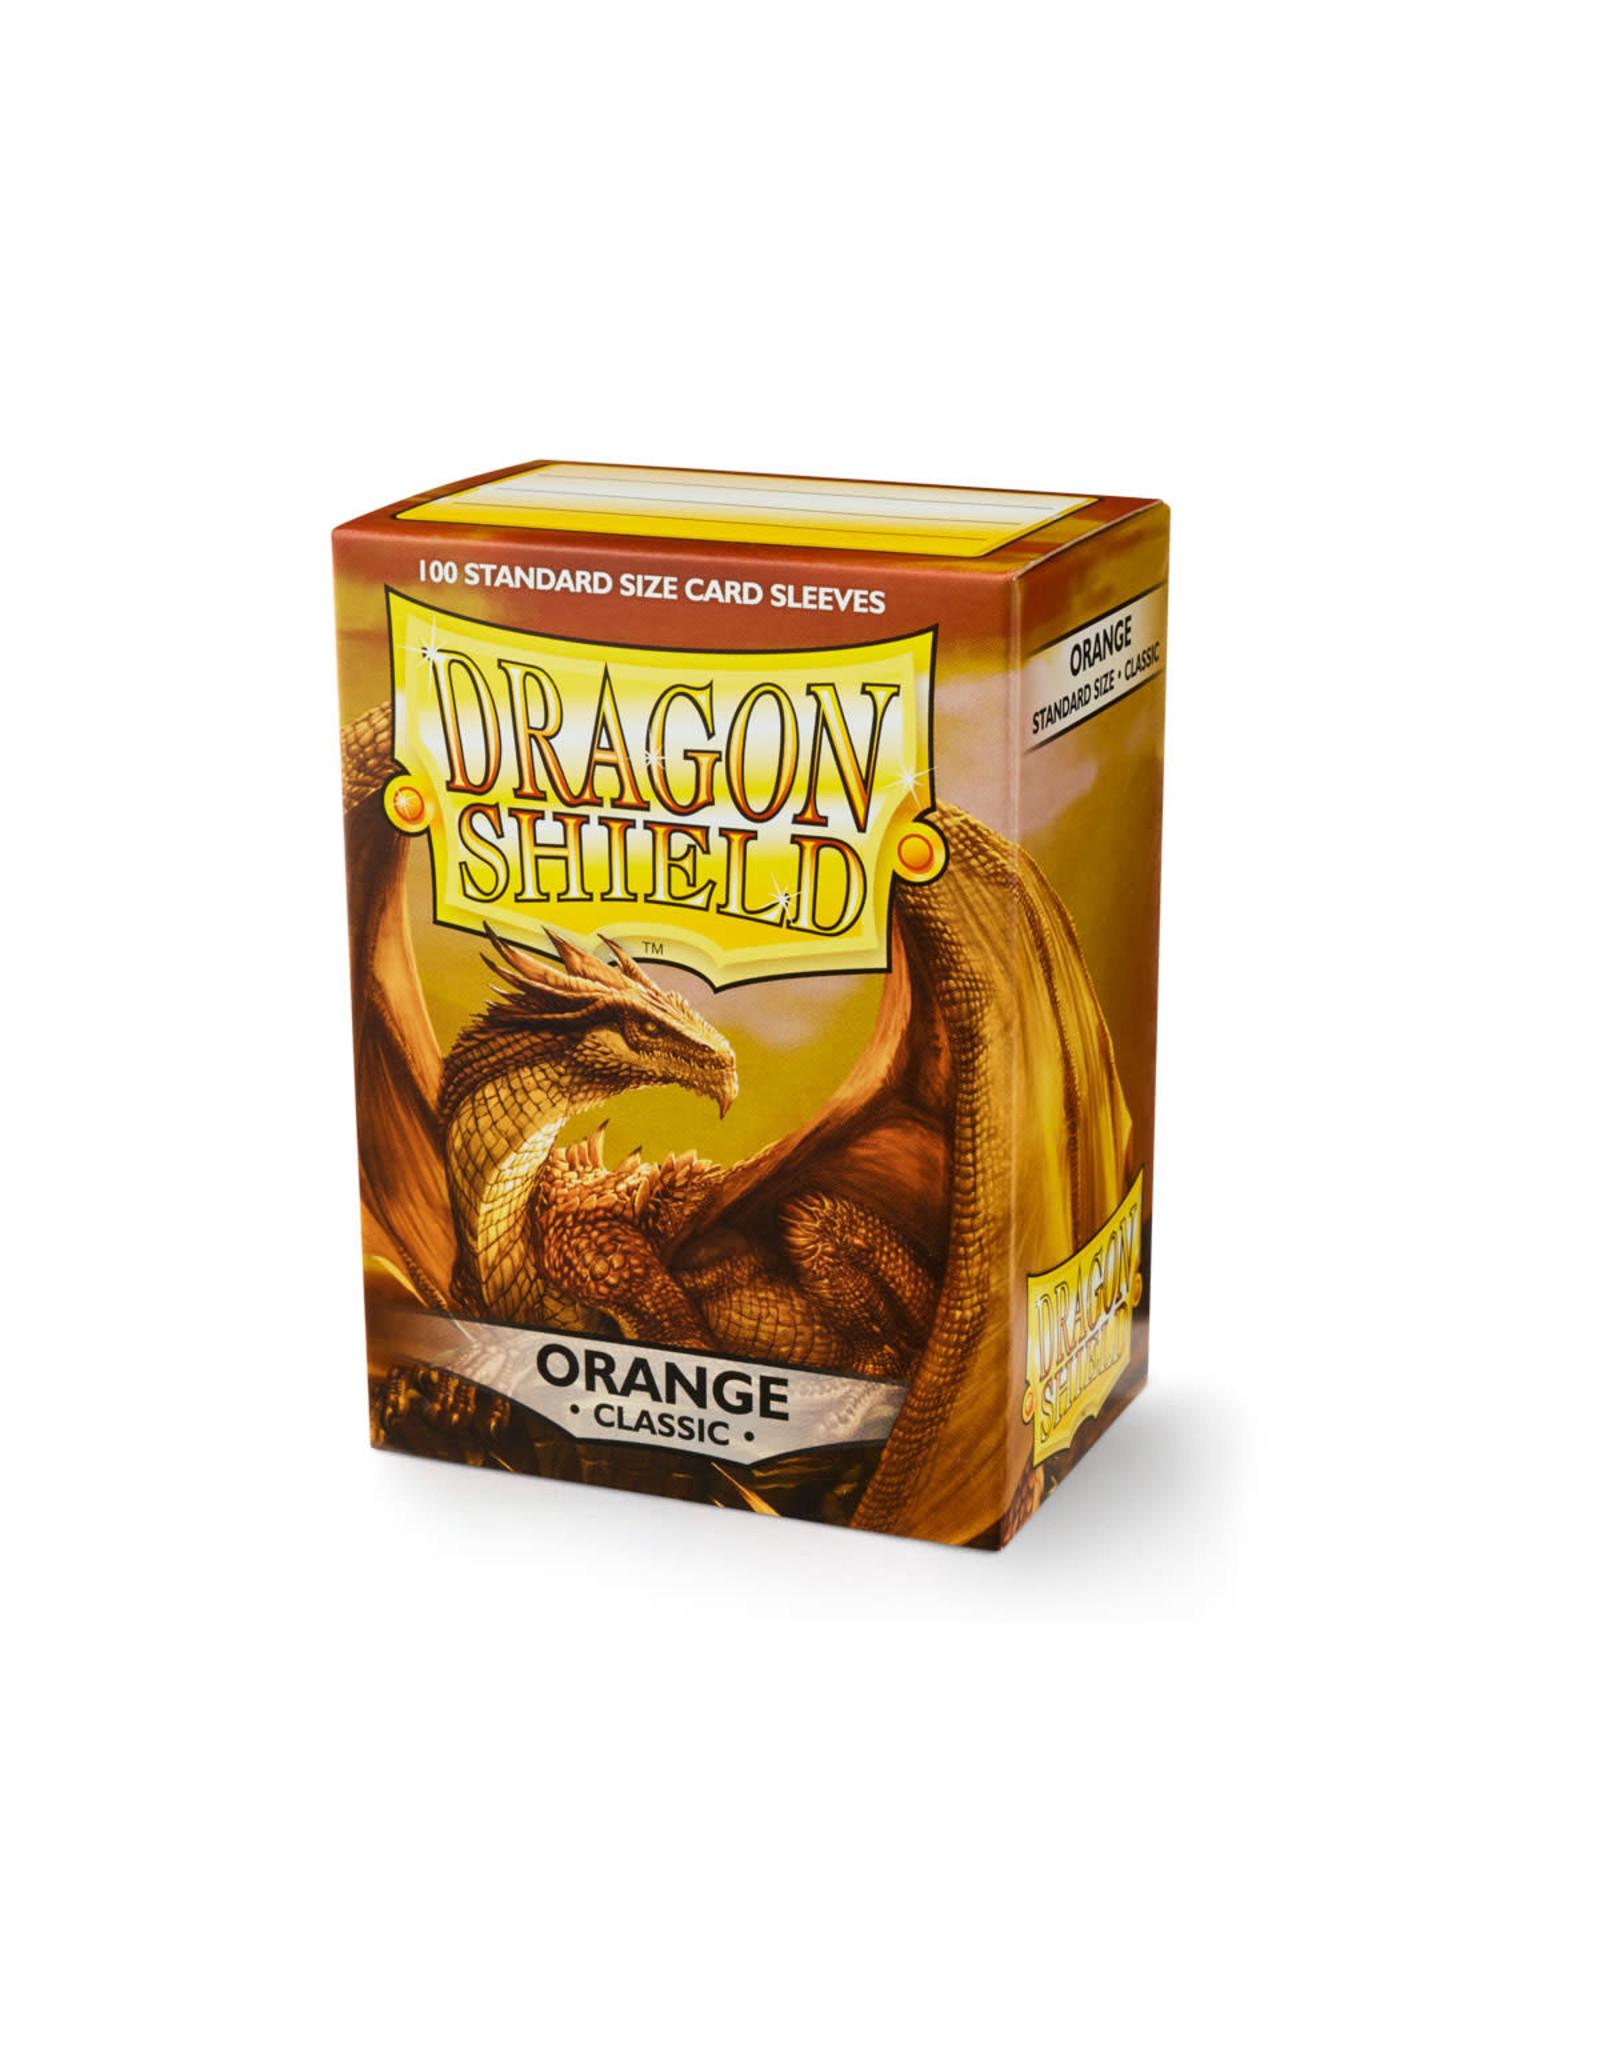 Arcane Tinmen Dragon Shield: Classic Orange Card Sleeves 100 Count